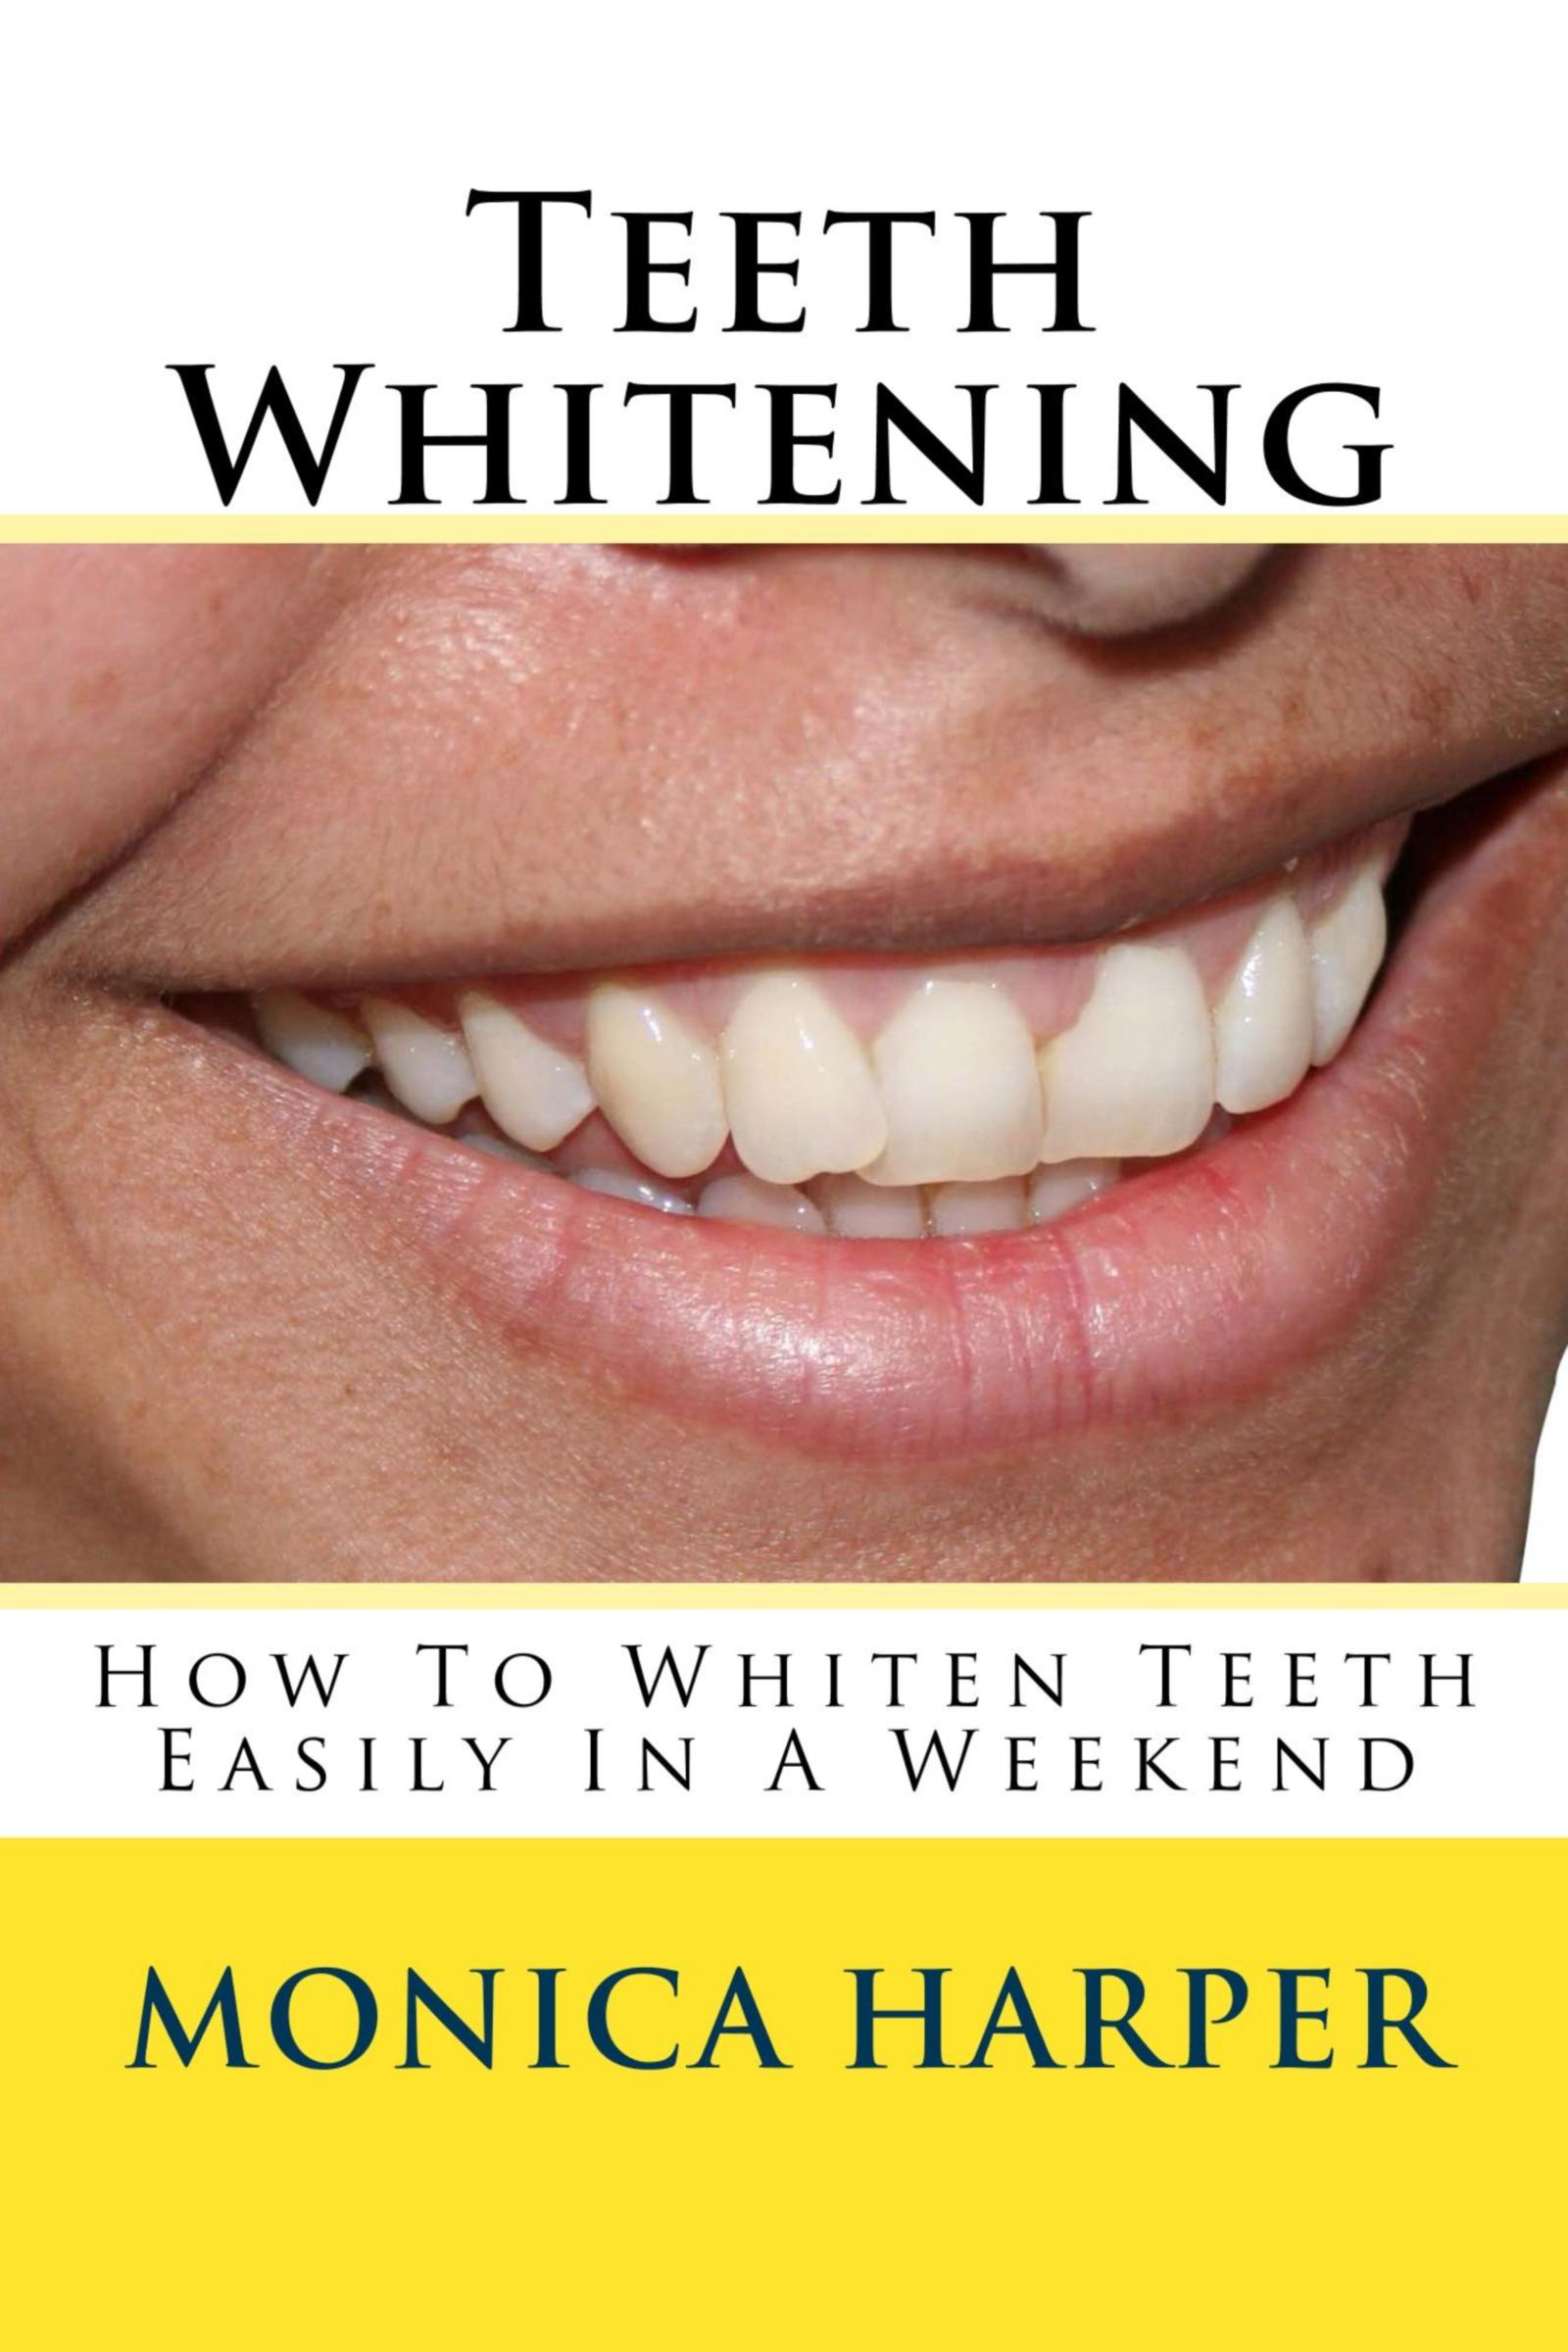 teeth whitening ebook